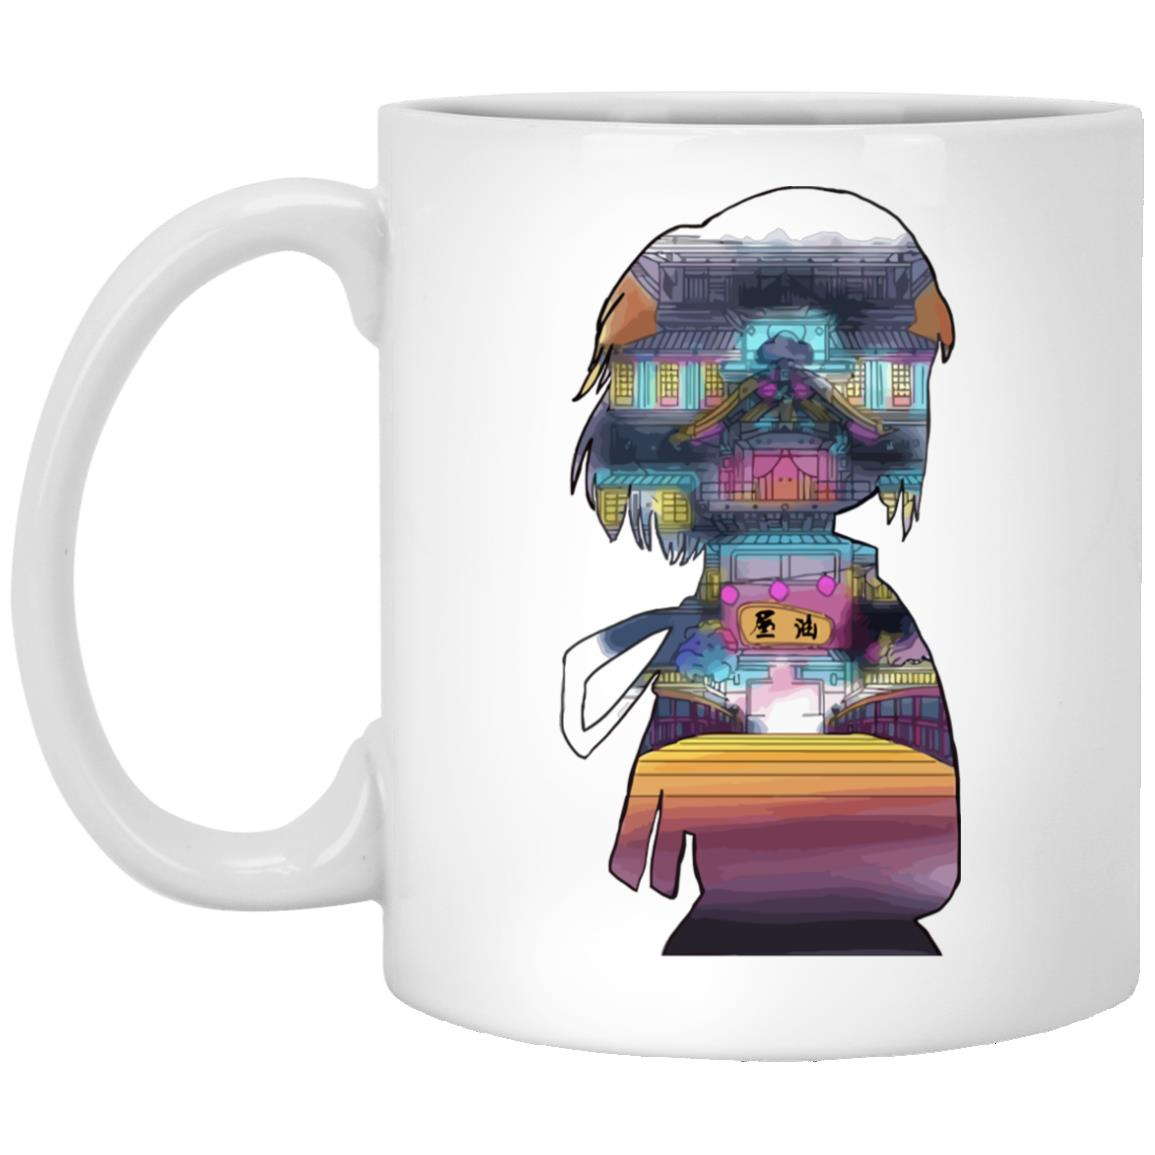 Spirited Away – Sen and The Bathhouse Cutout Colorful Mug